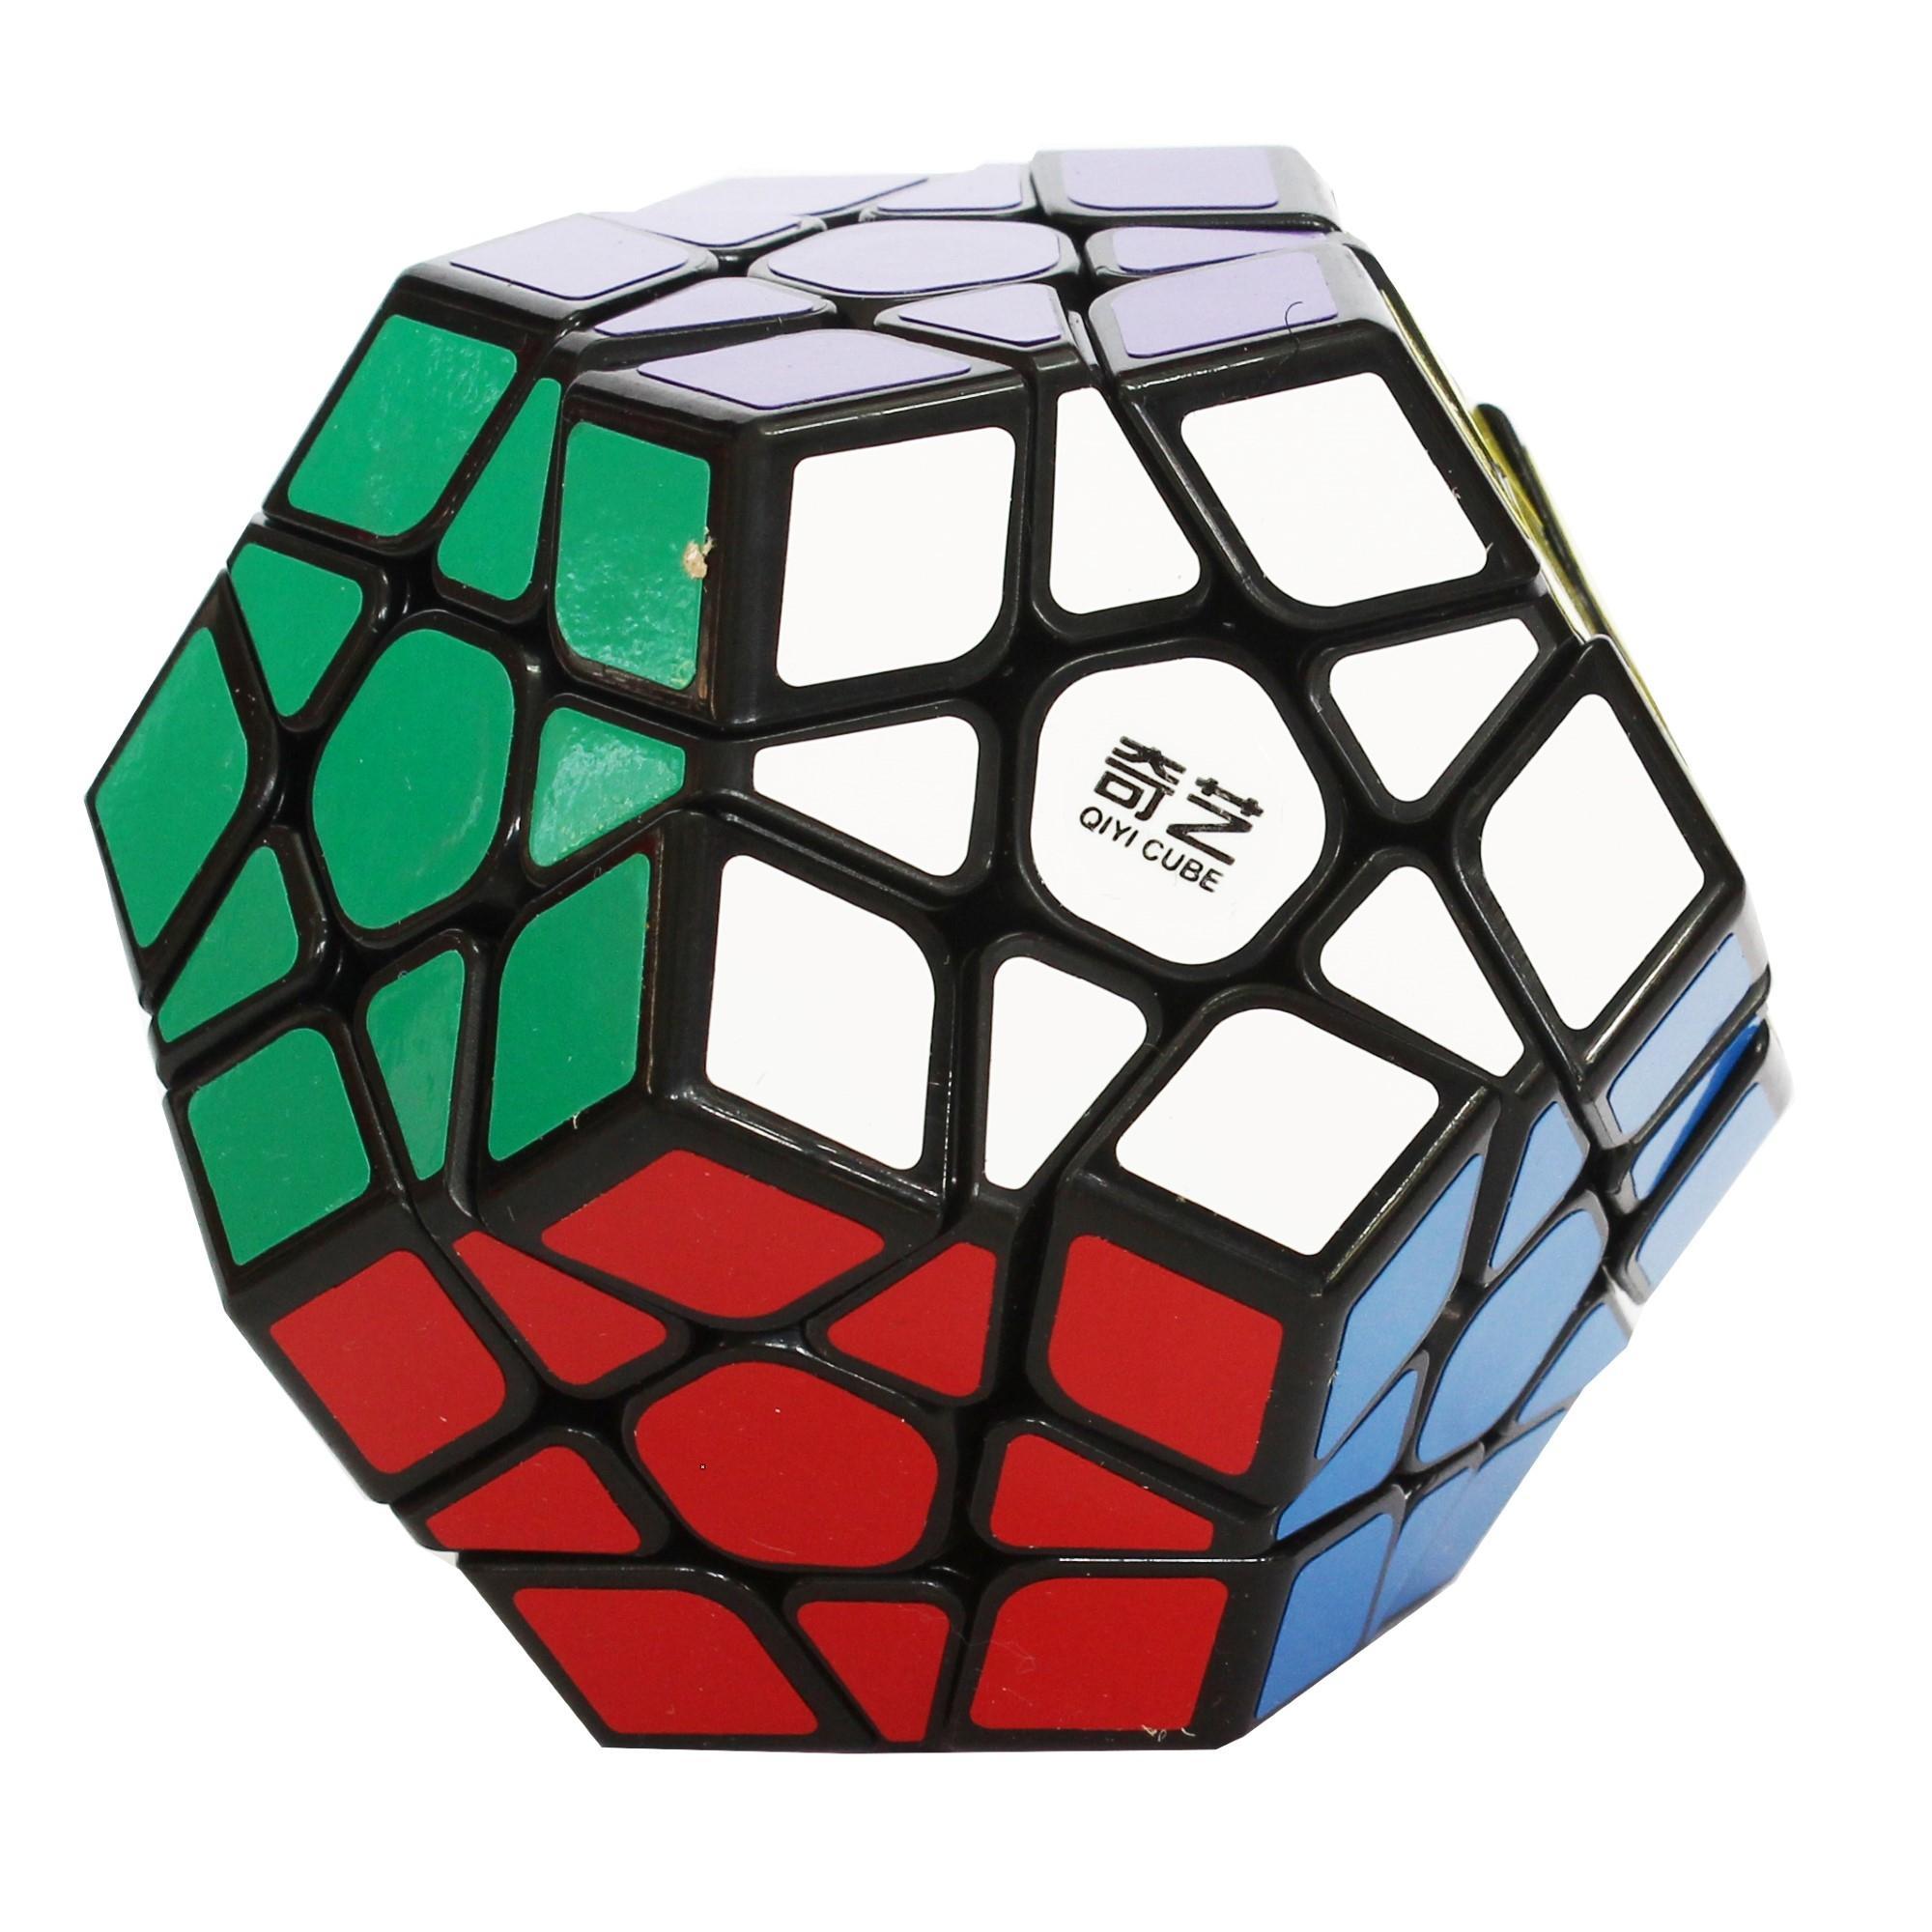 Cube Urban meinl ,christiano ronaldo,kivi,qi yi cube,urban eagle,jt,nec - buy